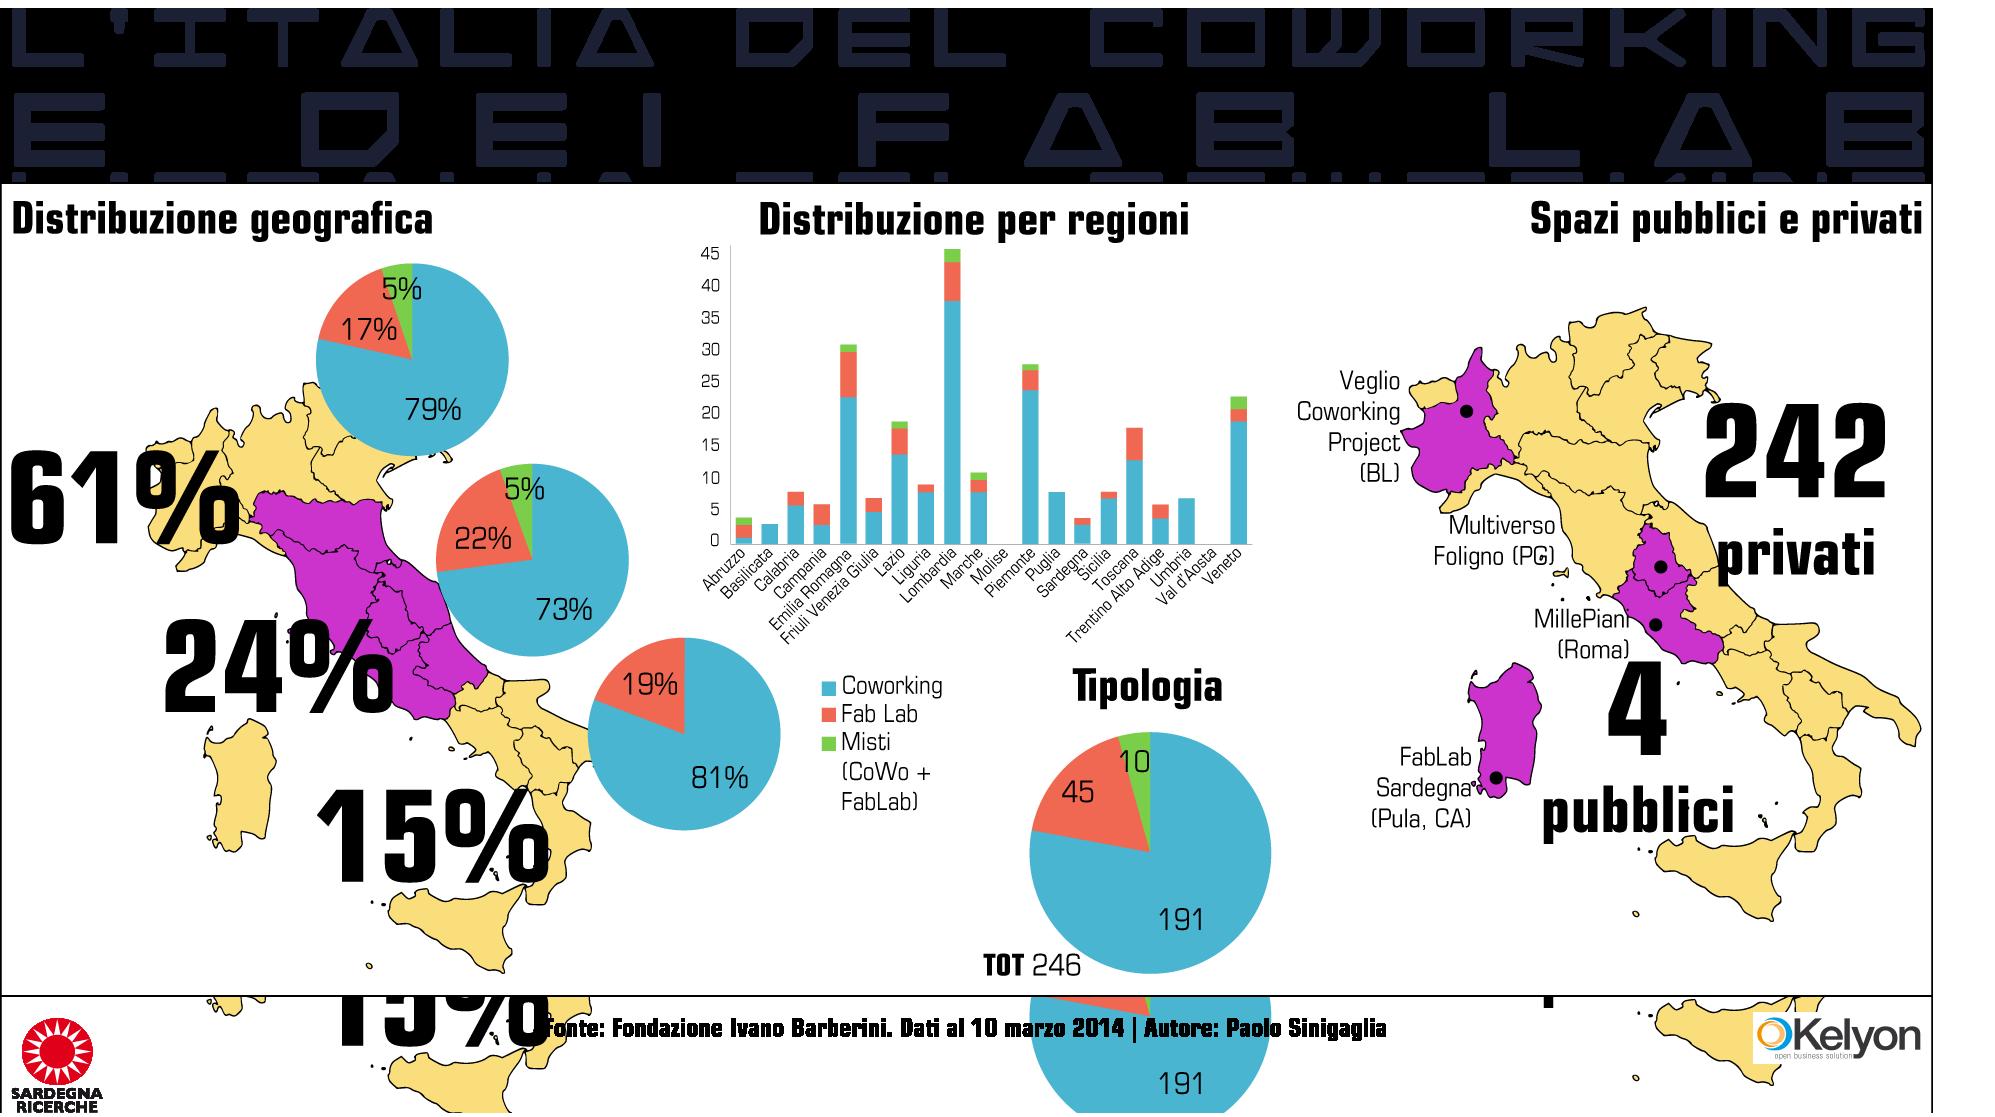 dati coworking italia